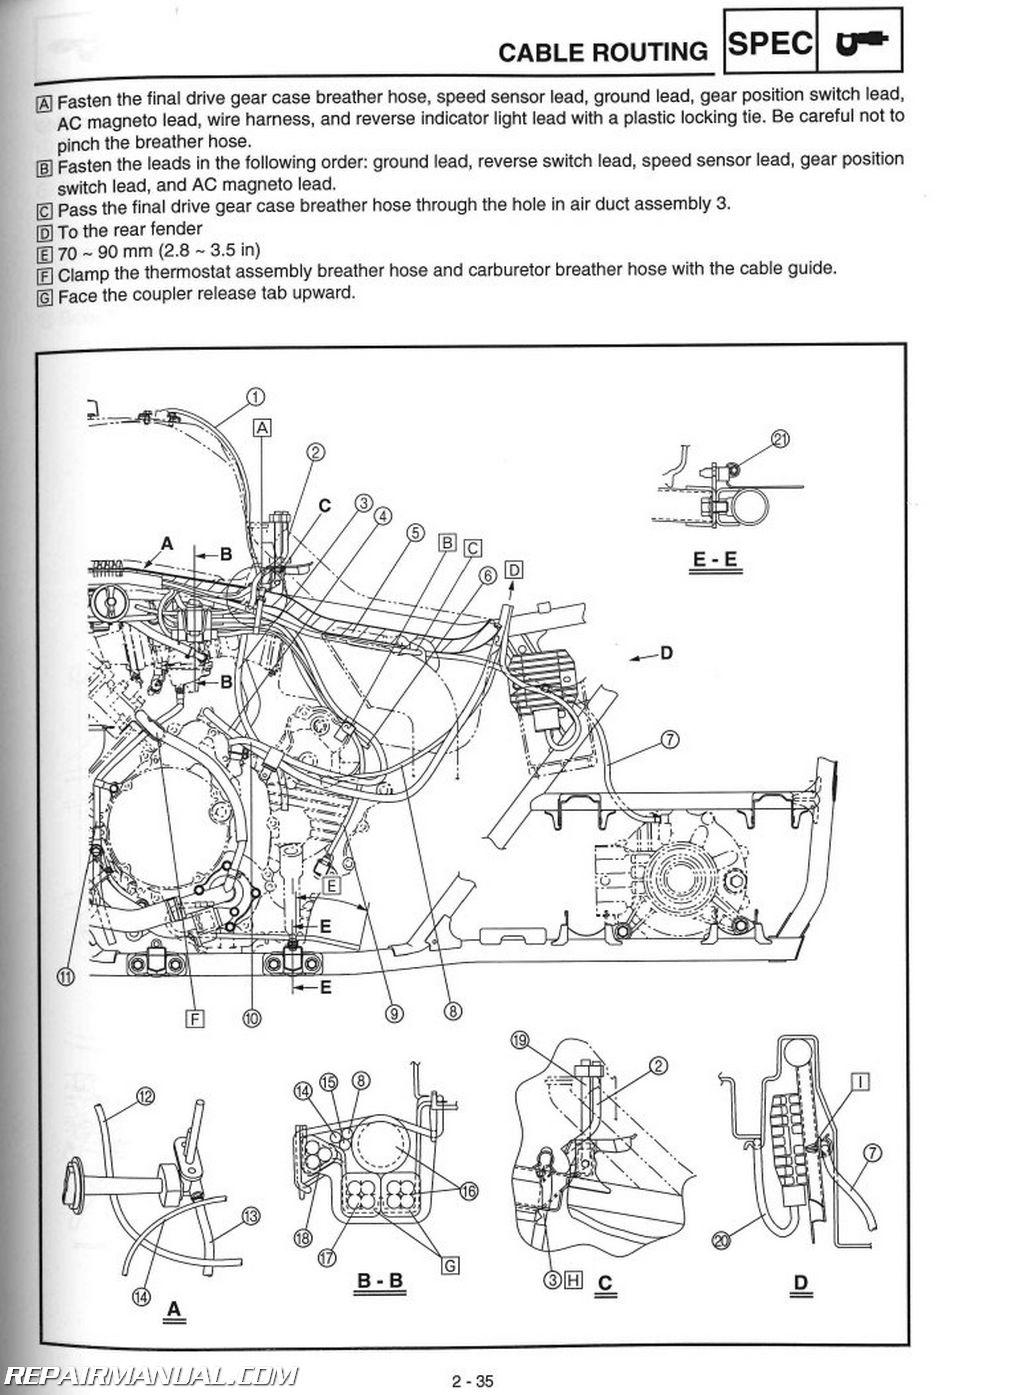 Ezgo Electric Golf Cart Wiring Diagram Yfm660fa Grizzly 660 Yamaha Atv Service Manual 2003 2008